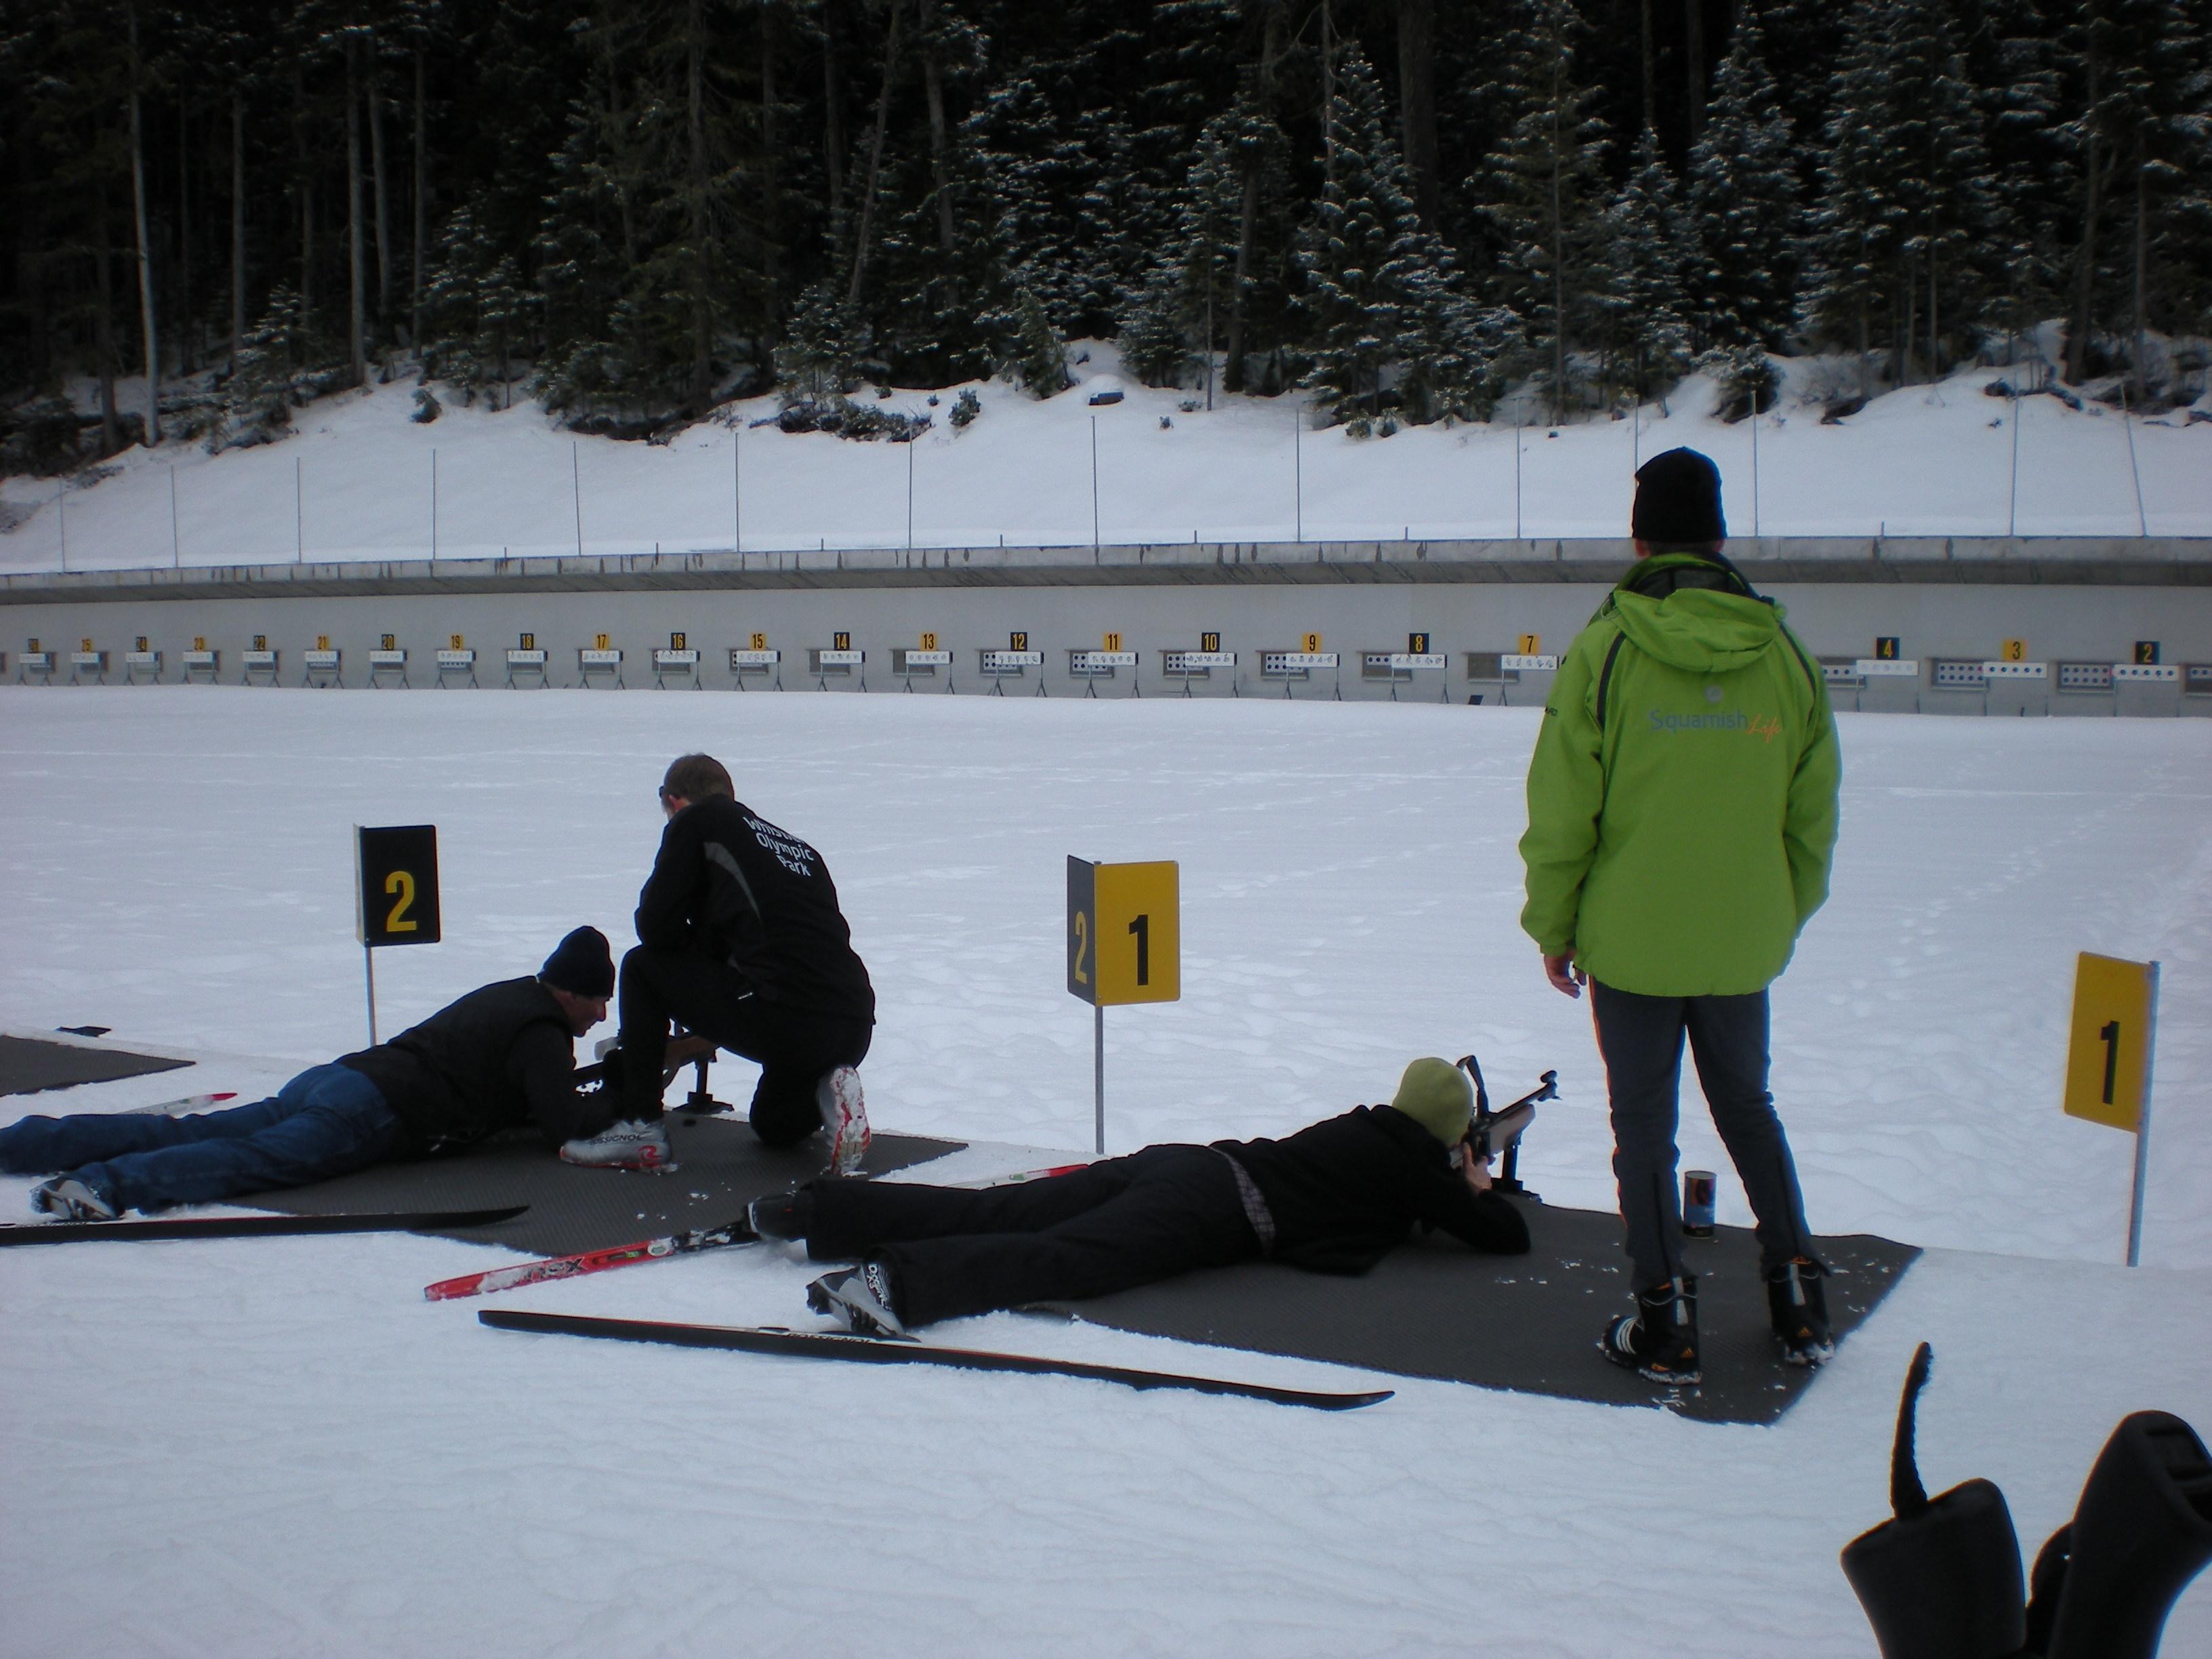 We take aim at the Whistler Biathlon Centre